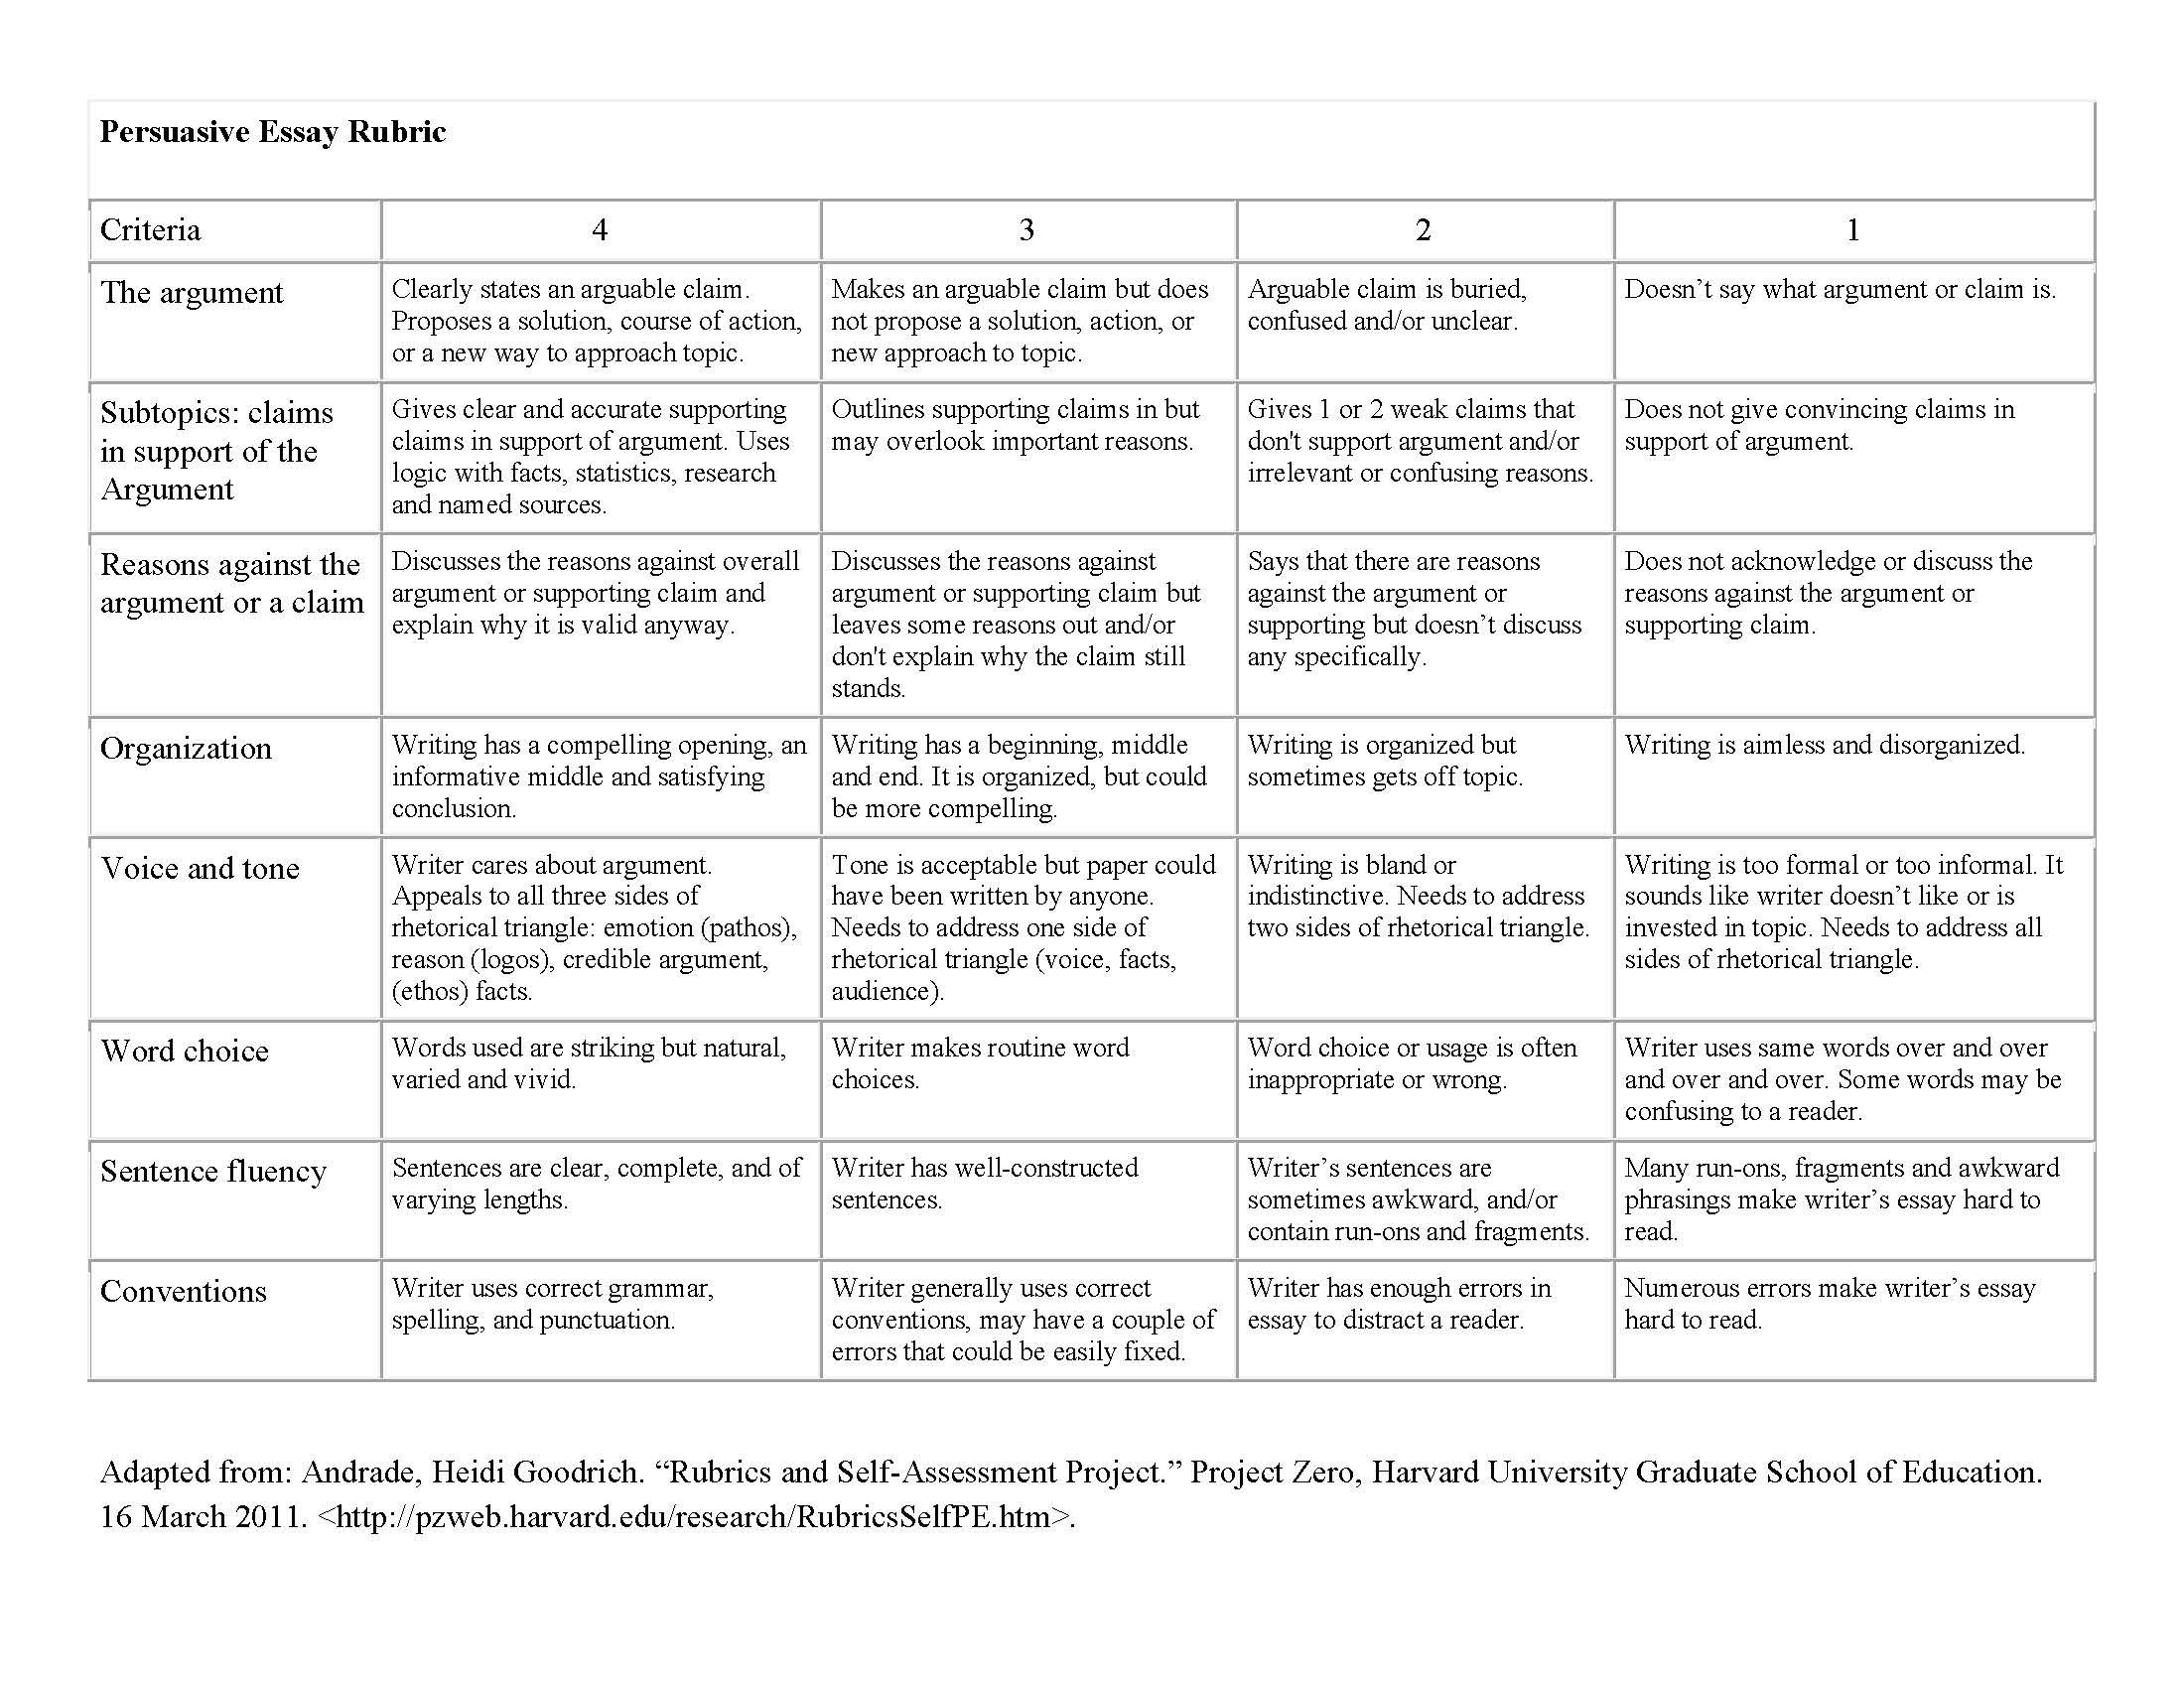 014 Handout Persuasive Essay Rubric Rubrics In Writing Formidable Holistic For Pdf Middle School Full